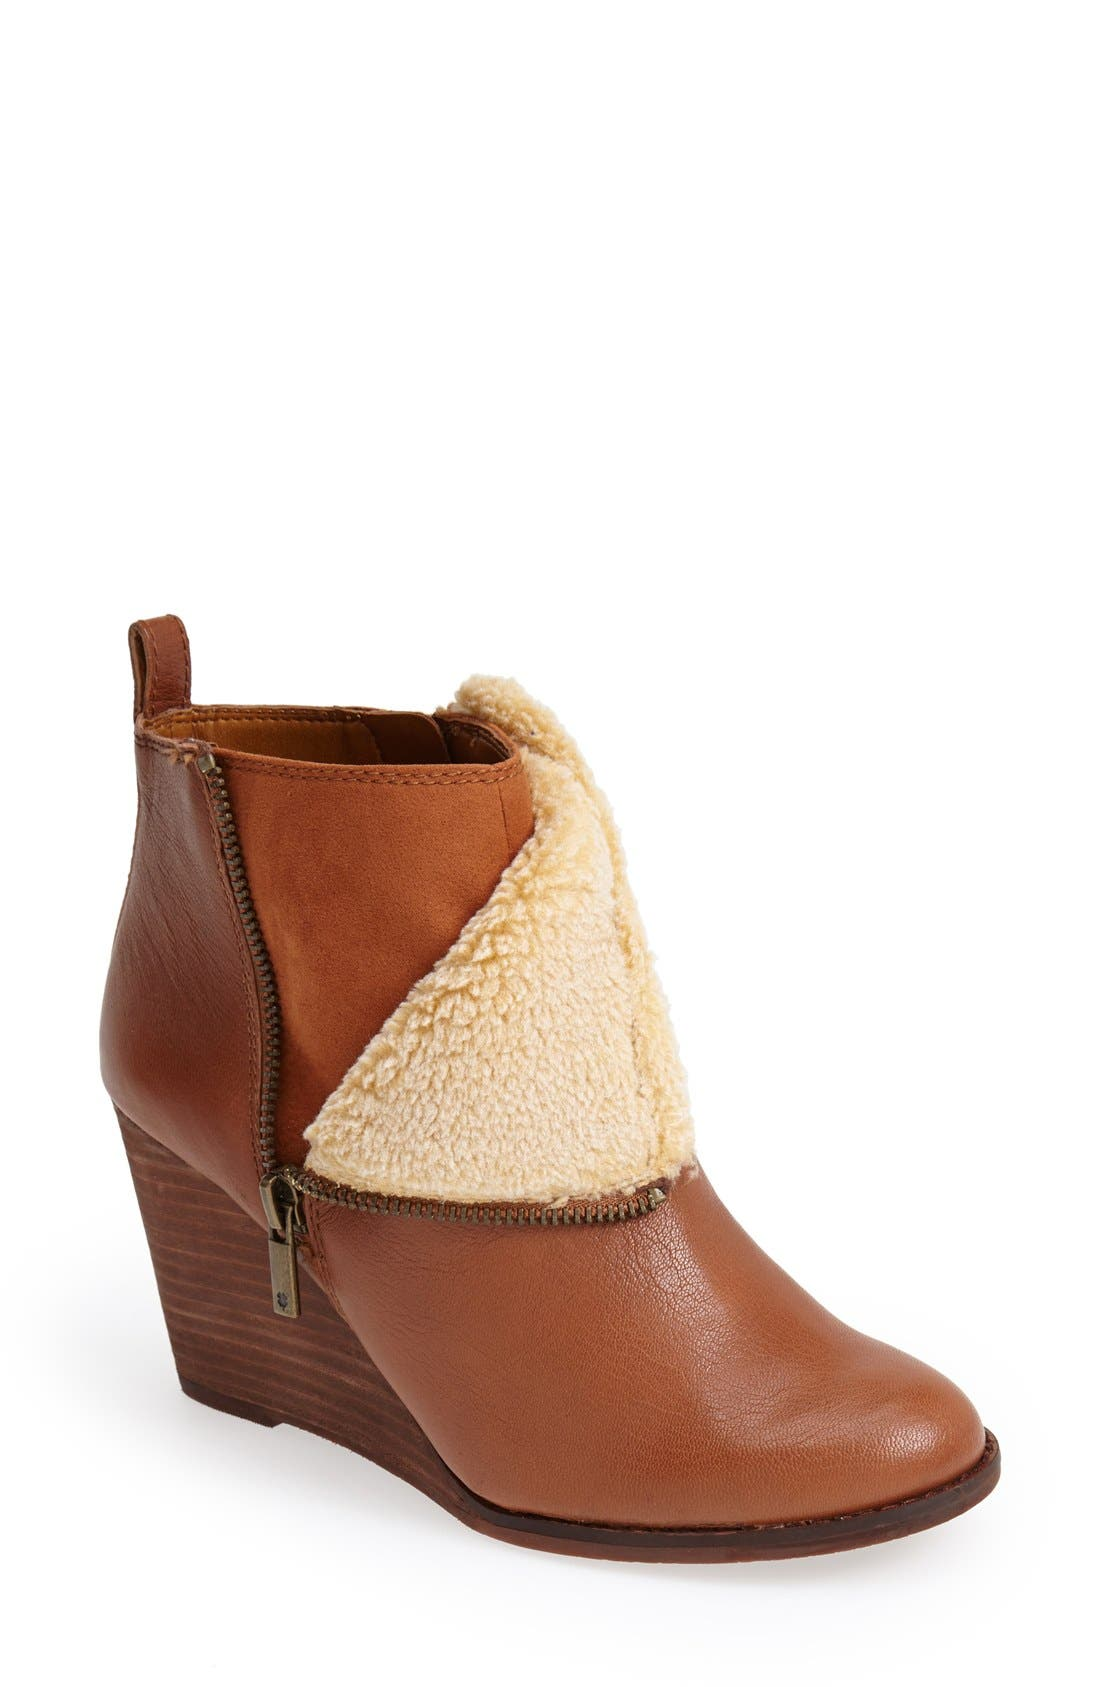 Main Image - Lucky Brand 'Yorque' Wedge Leather Bootie (Women)